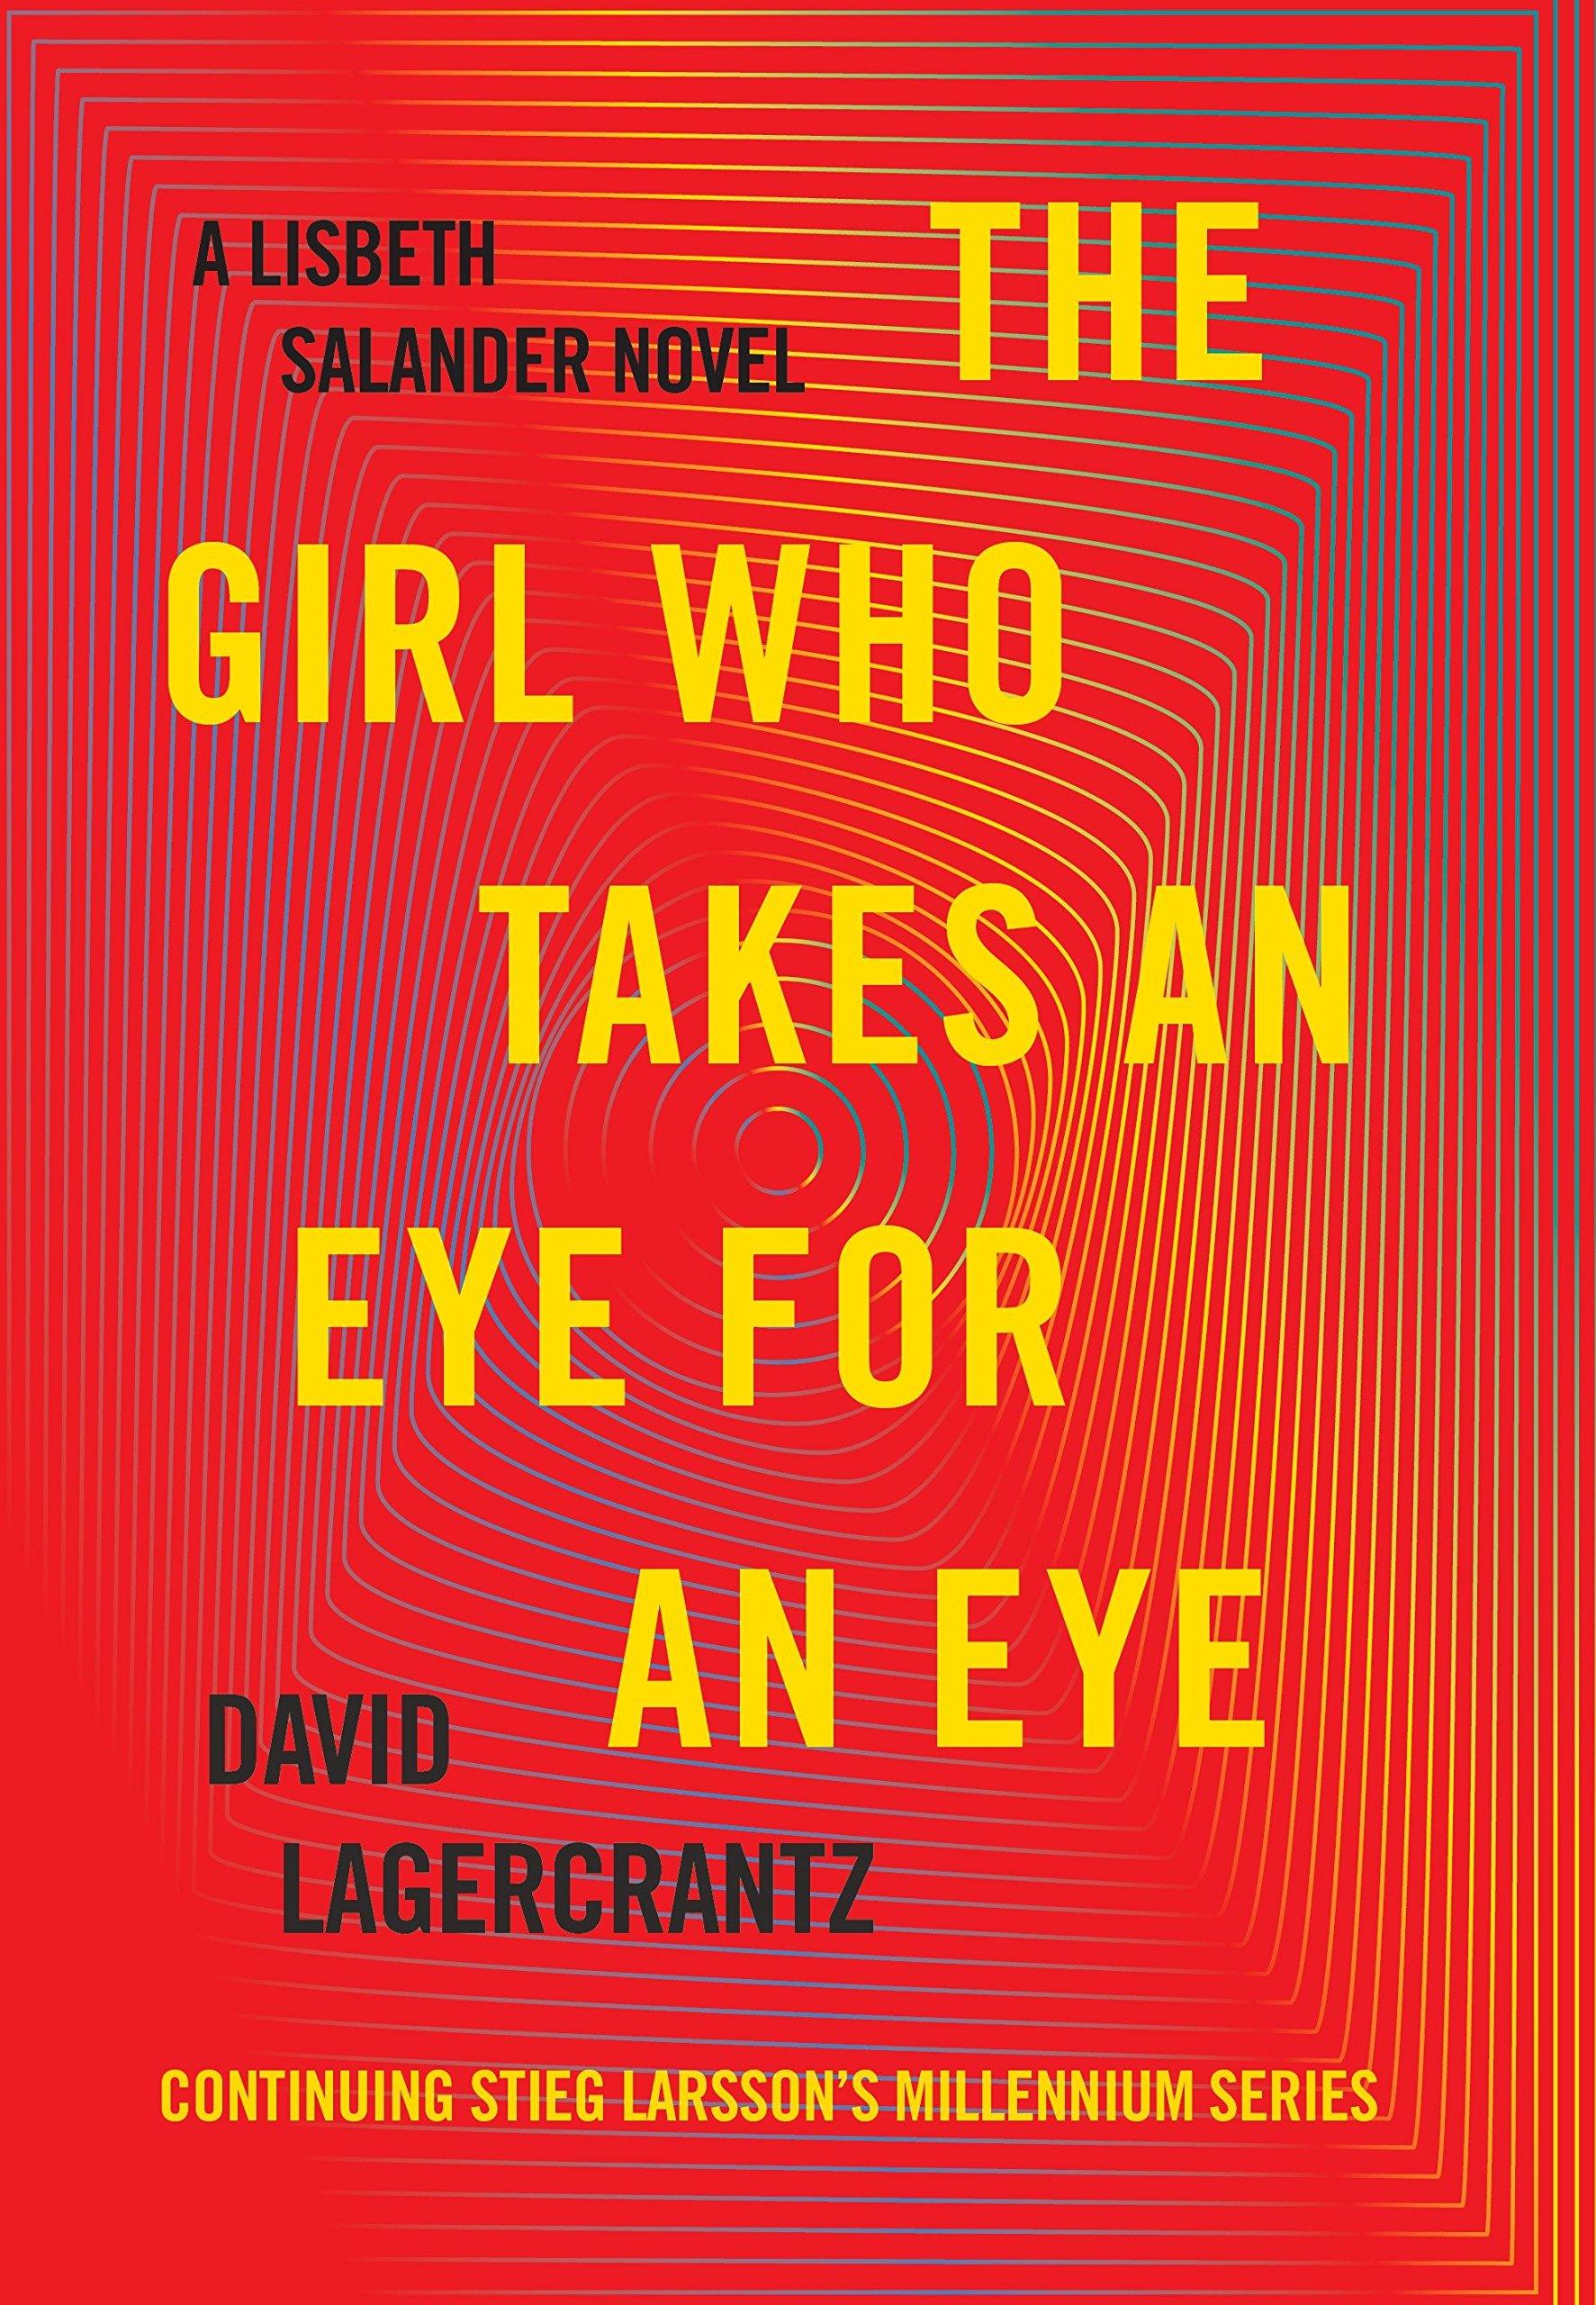 The Girl Who Takes an Eye for an Eye: A Lisbeth Salander novel, continuing Stieg Larsson's Millennium Series pdf